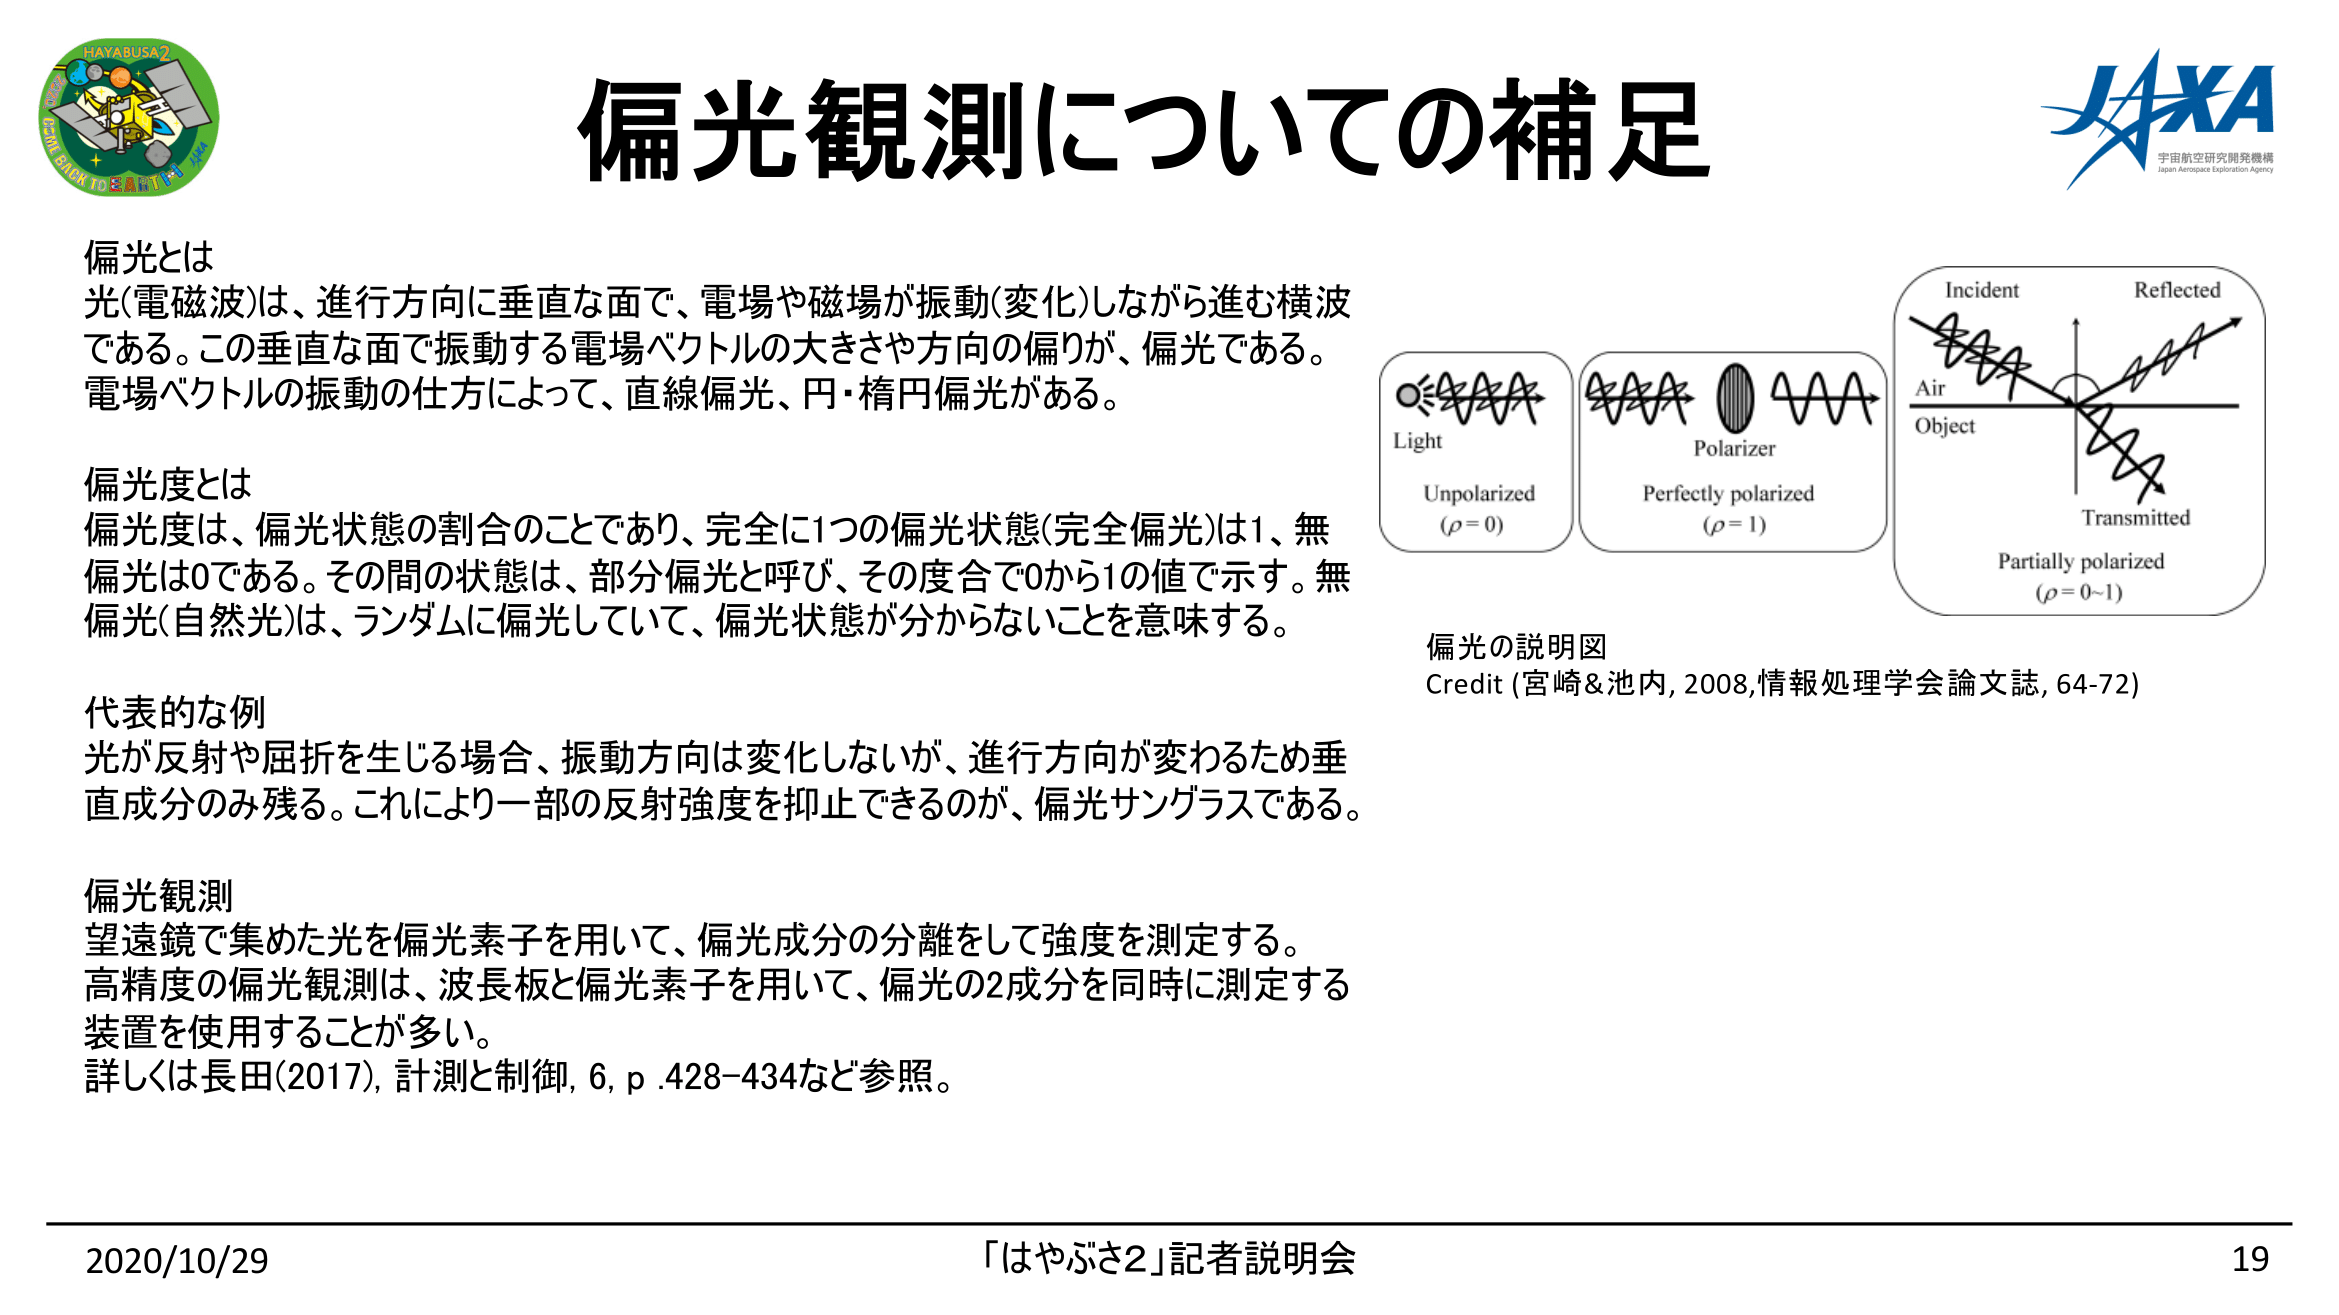 f:id:Imamura:20201029161443p:plain